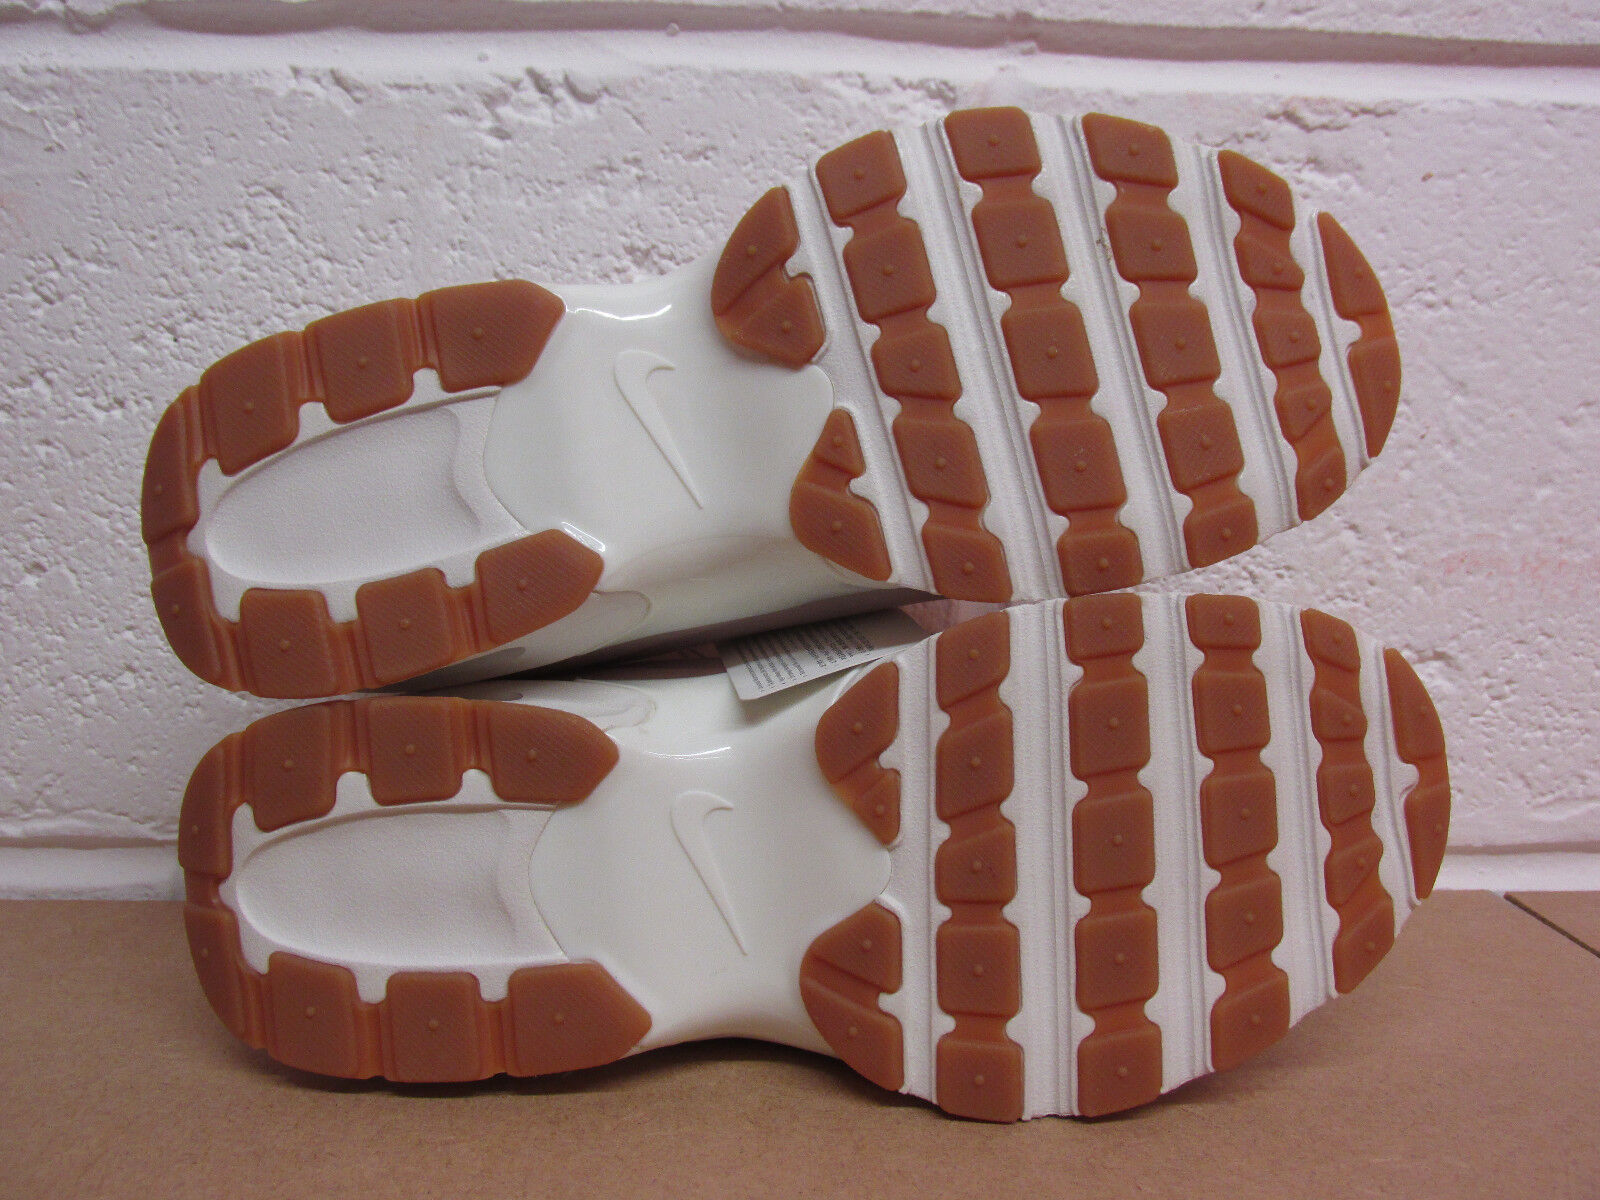 Se le scarpe nike kmtr komyuter kmtr nike birch cachi marrone aa0531 200 uomini '46 d4b351